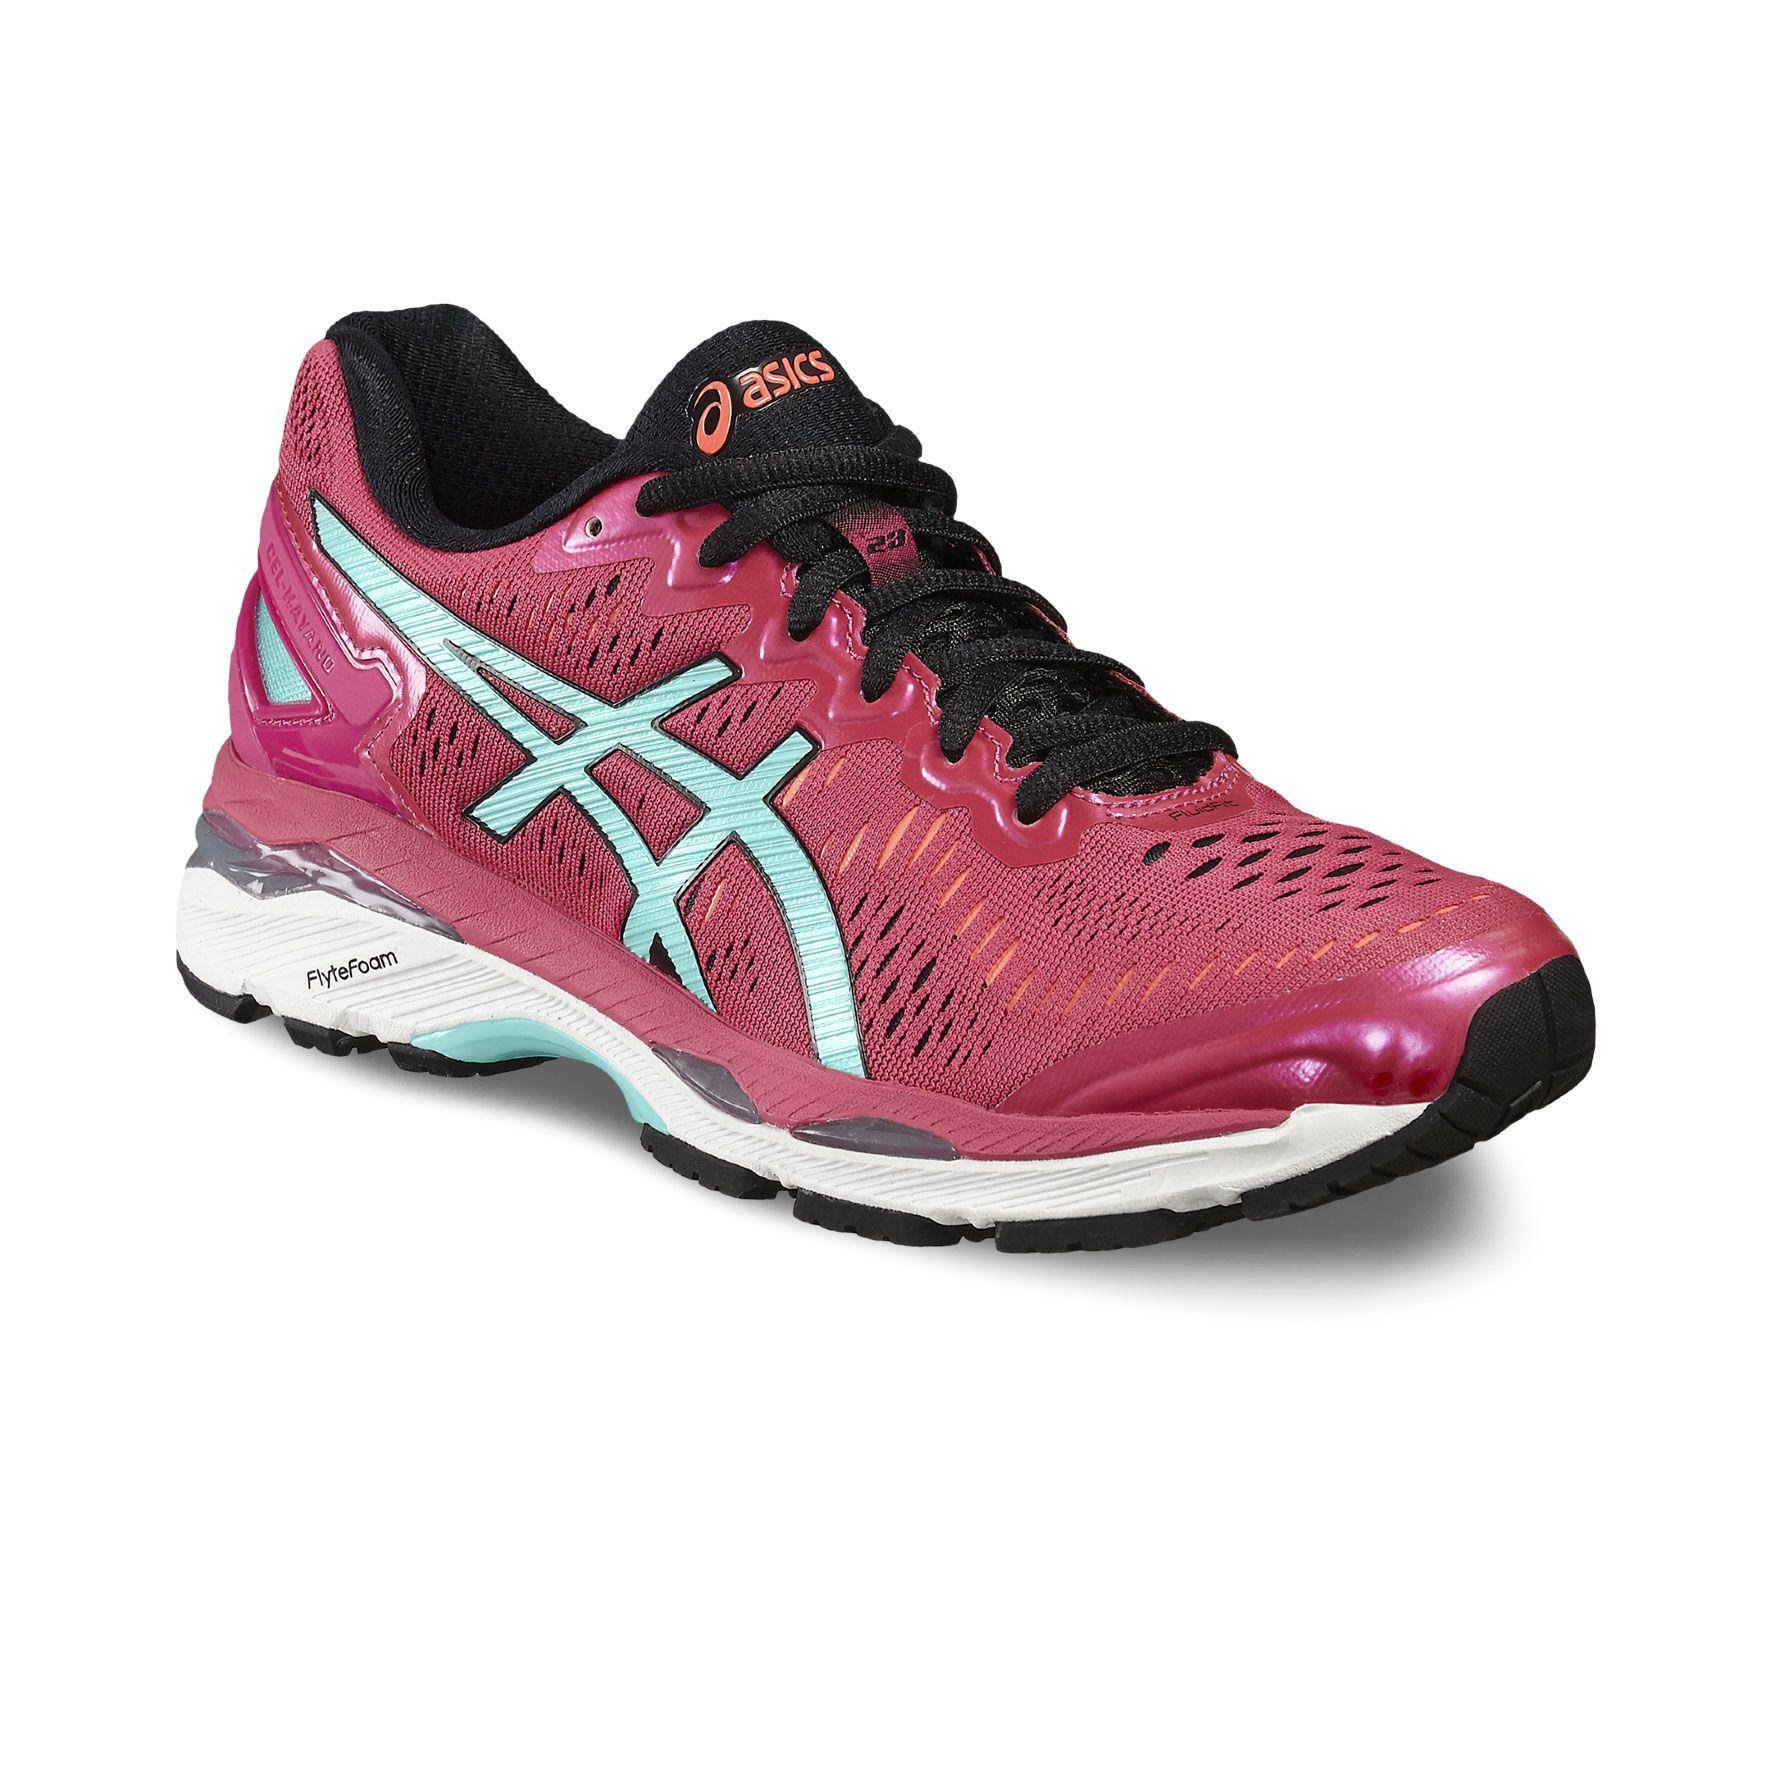 Asics Gel-Kayano 23 Ladies Running Shoes AW16 - Sweatband.com